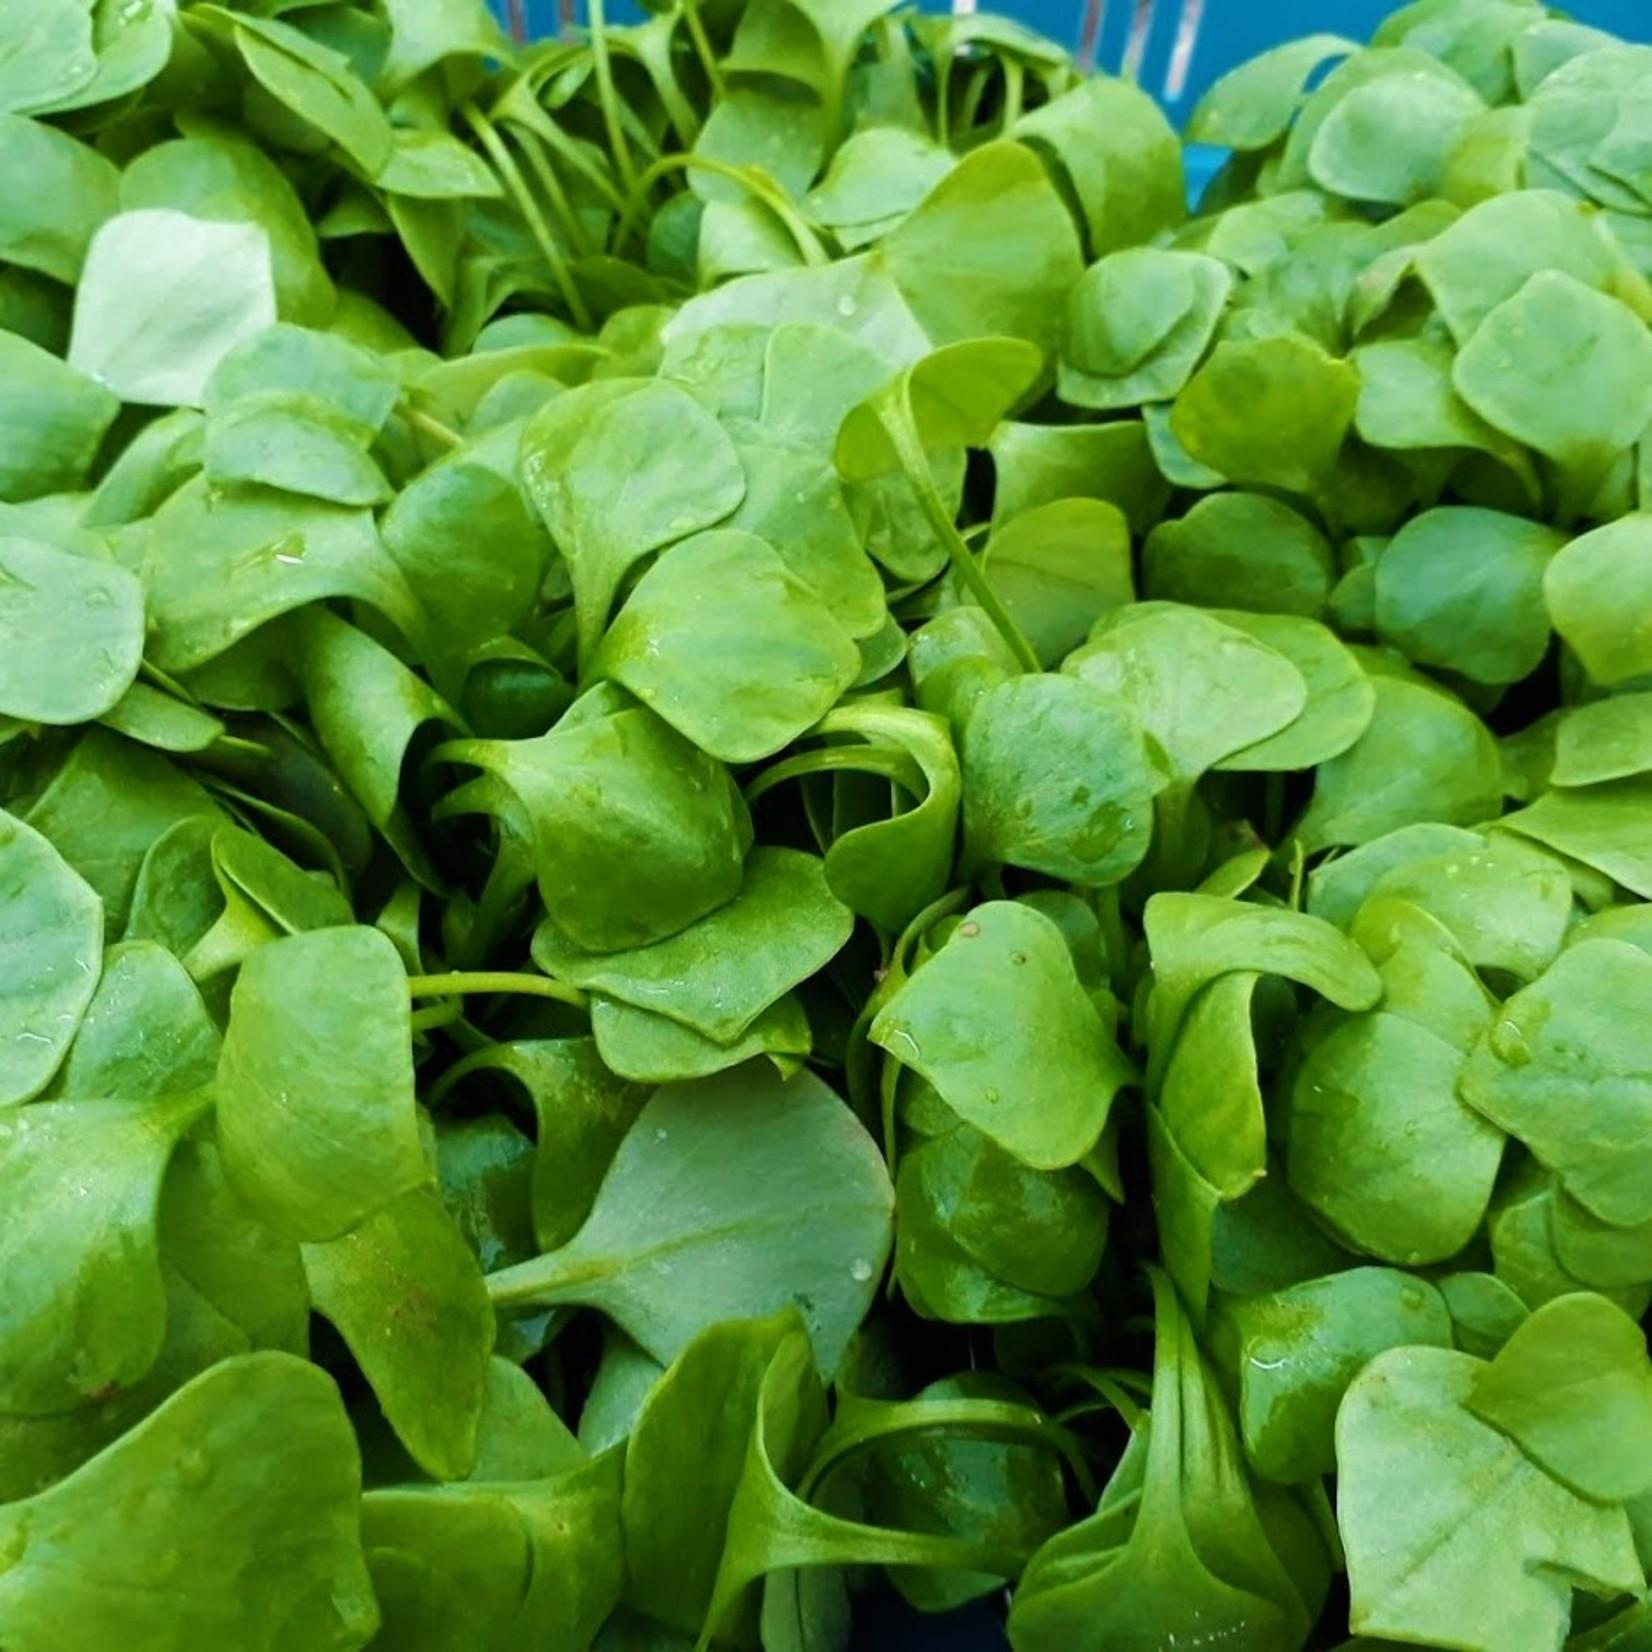 Winterpostelein (vitaminebom) | Inclusief Recept | Per doos (De Groene Schuur)